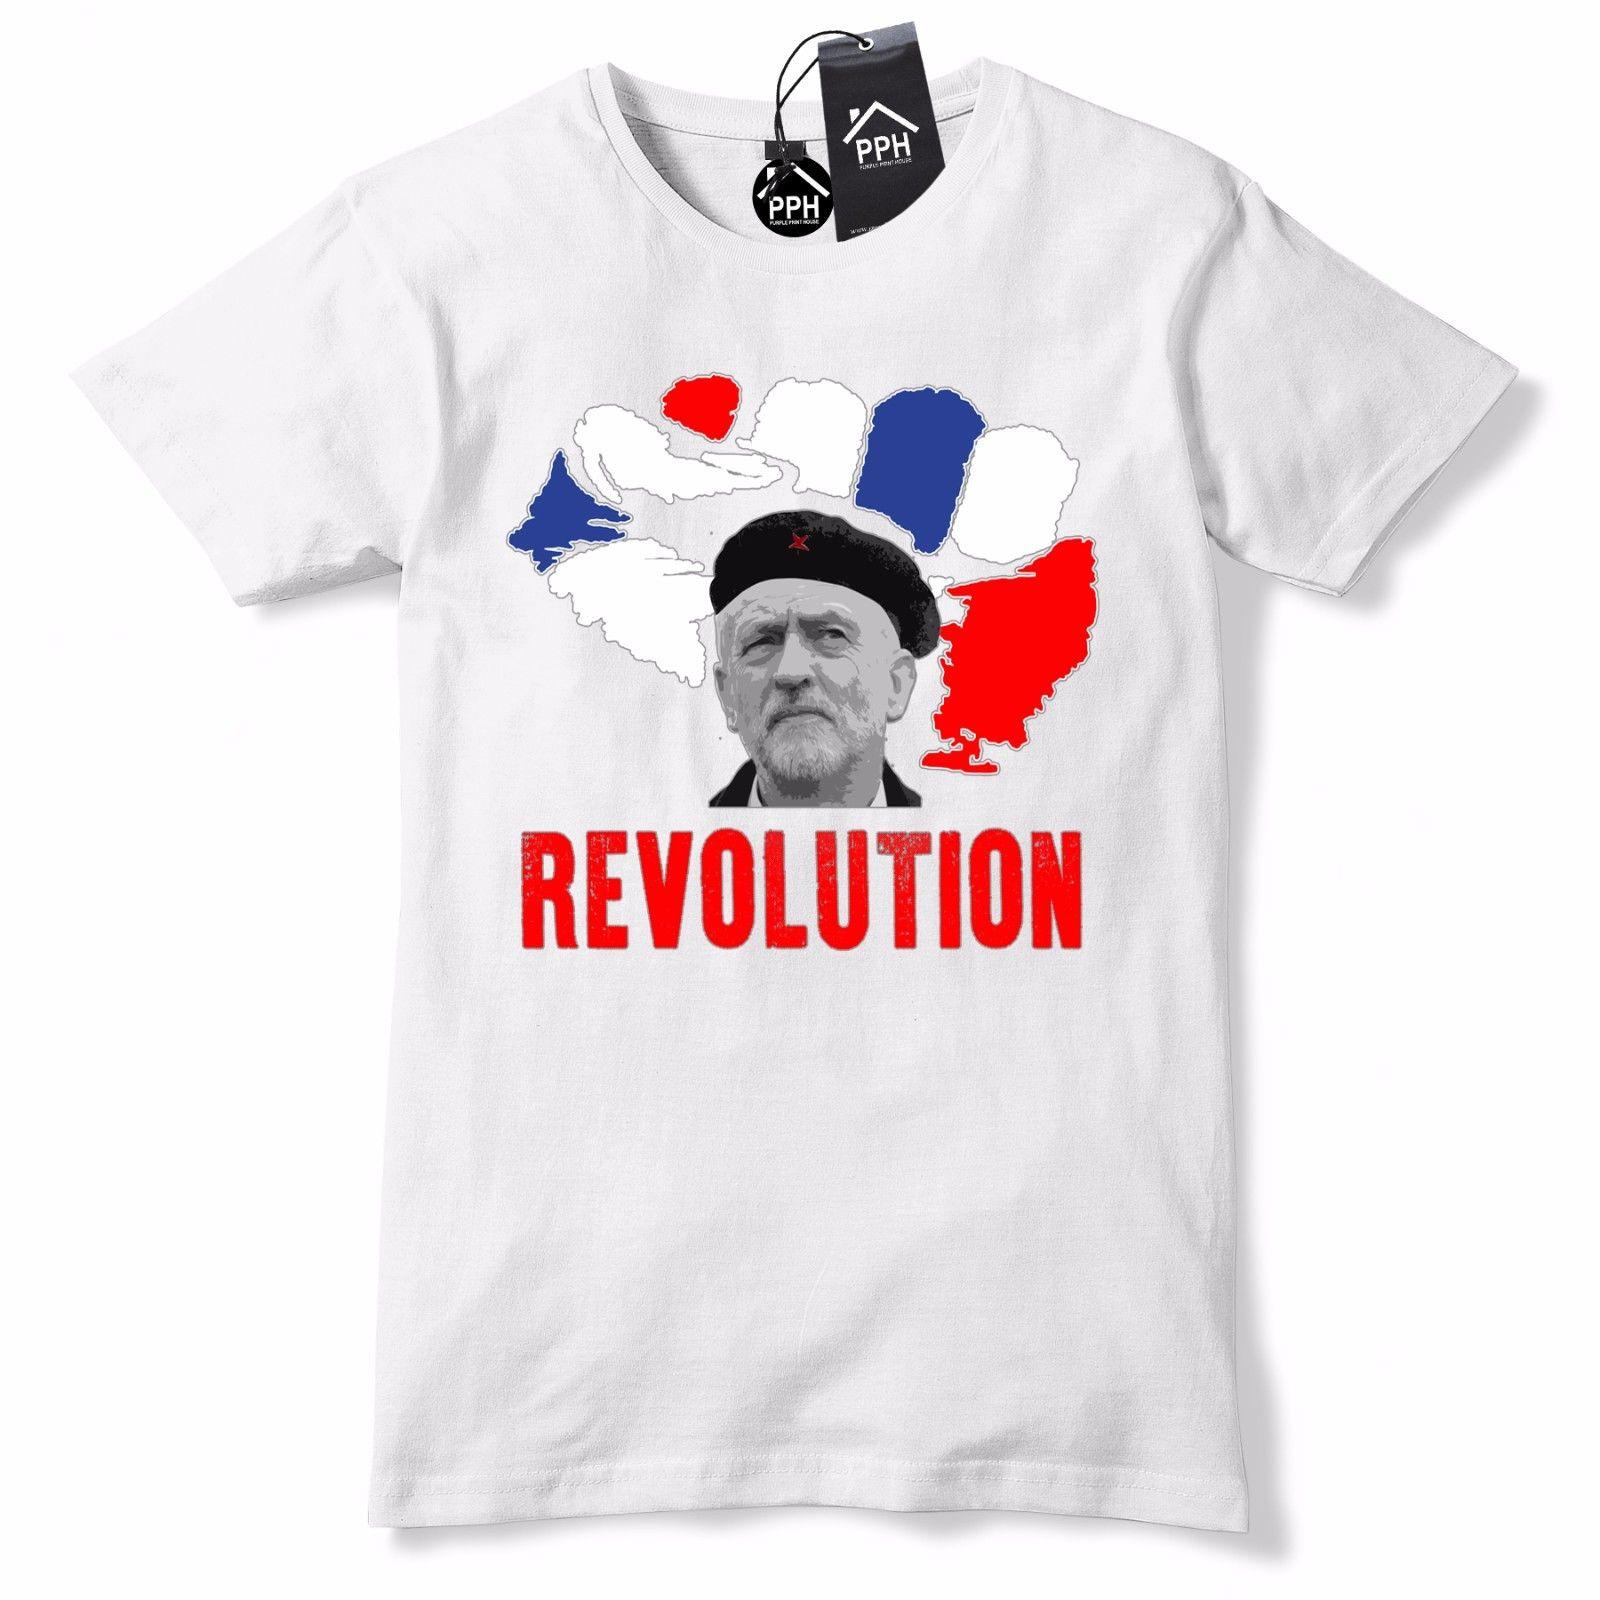 Revolution Jeremy Corbyn T Shirt UK Election Corbin Tshirt che guevara 596